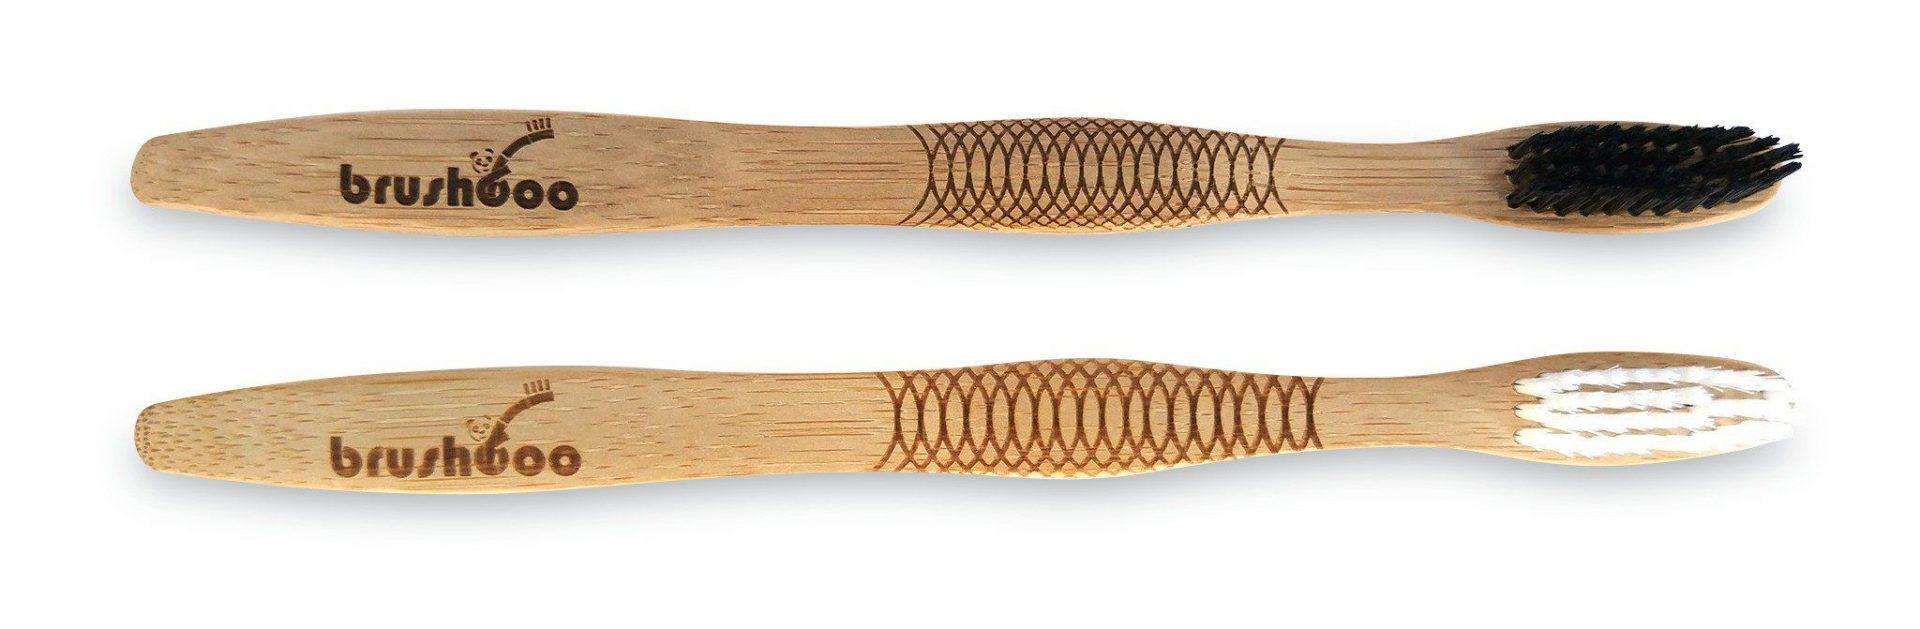 Cepillos de dientes de bambu adultos